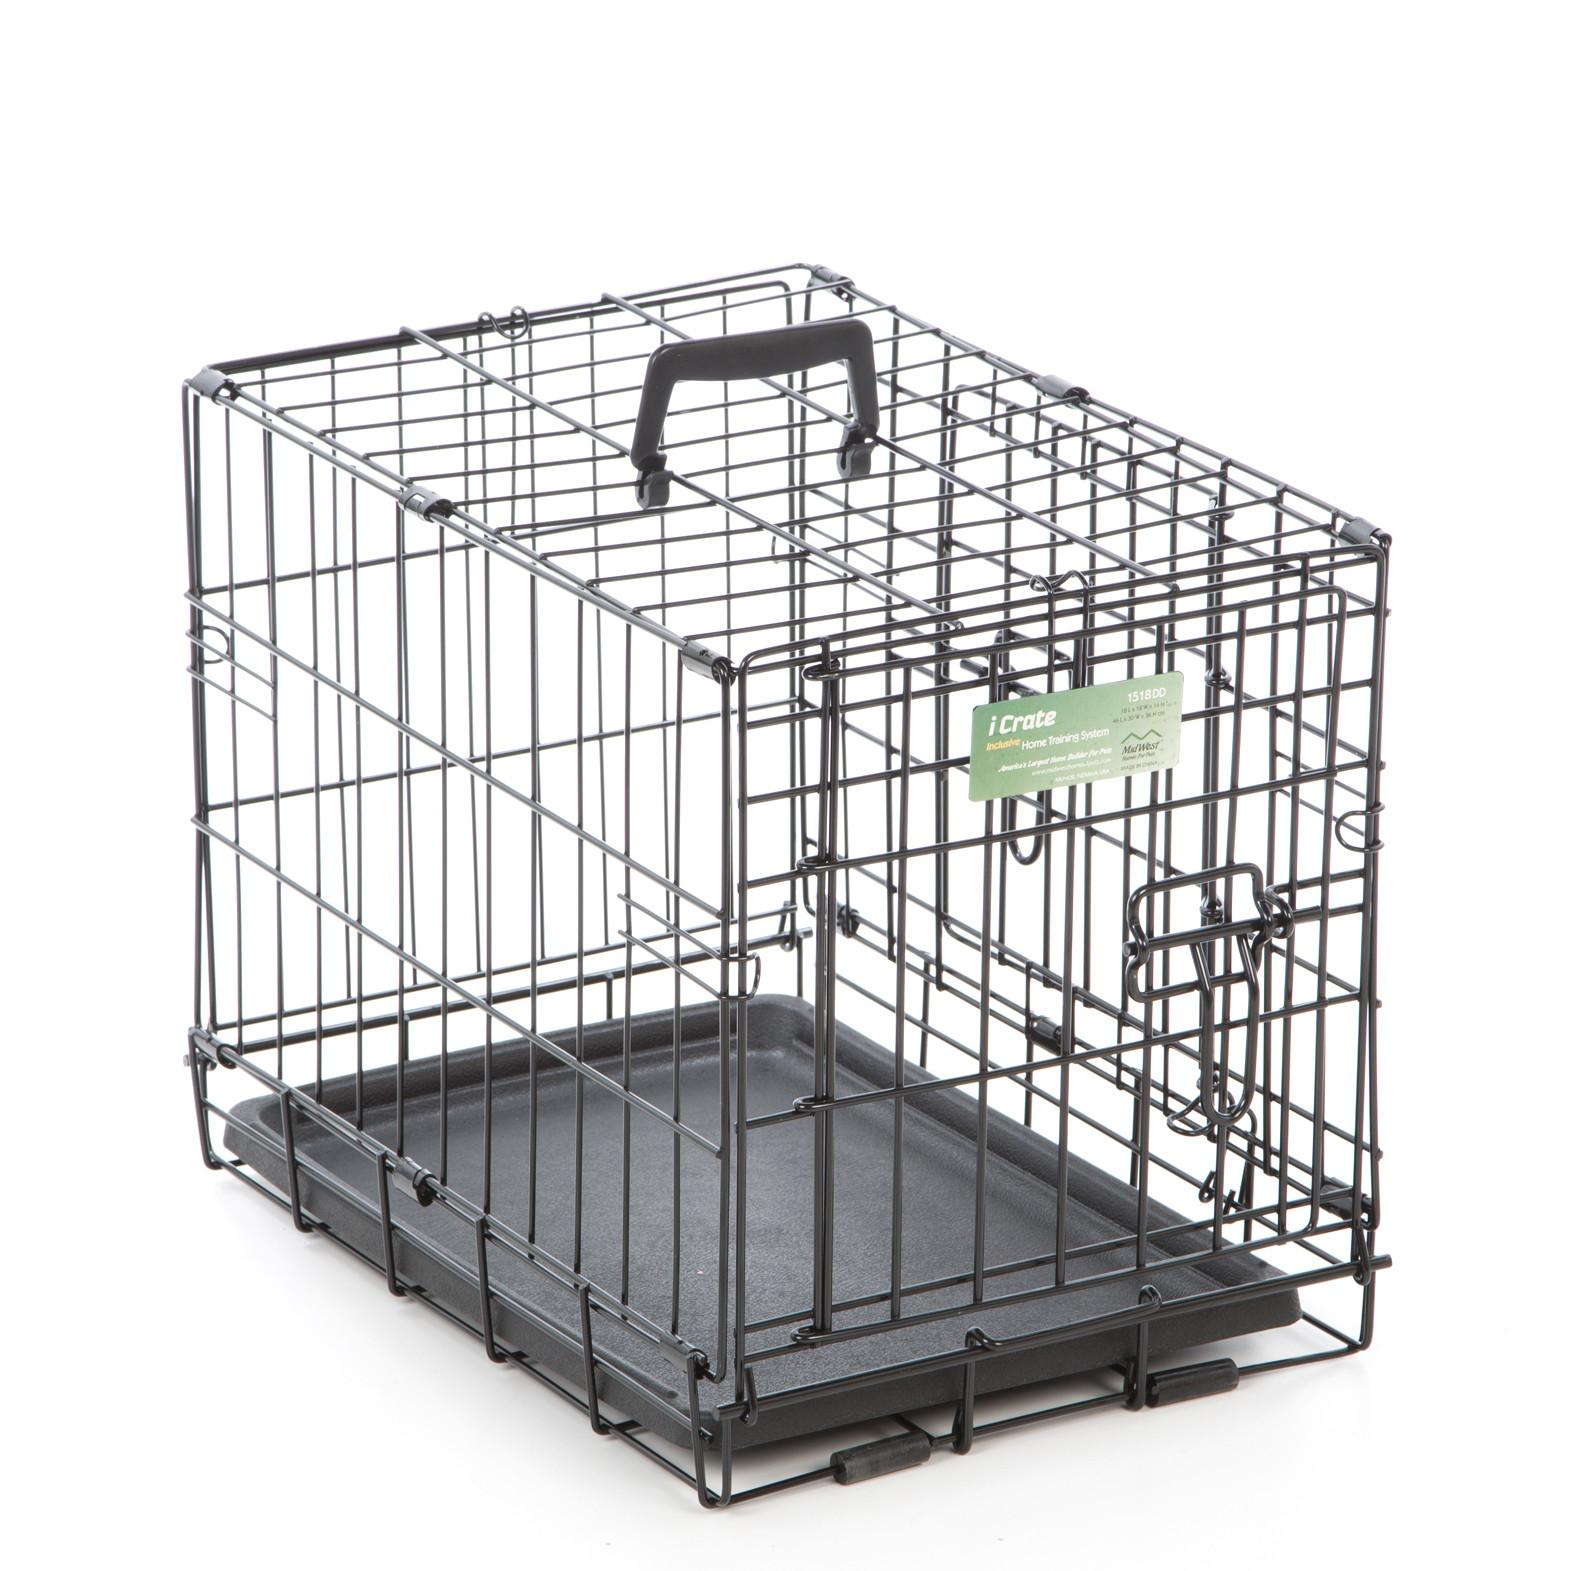 midwest dog crates 48 x 36 dog crate amazon large dog crate